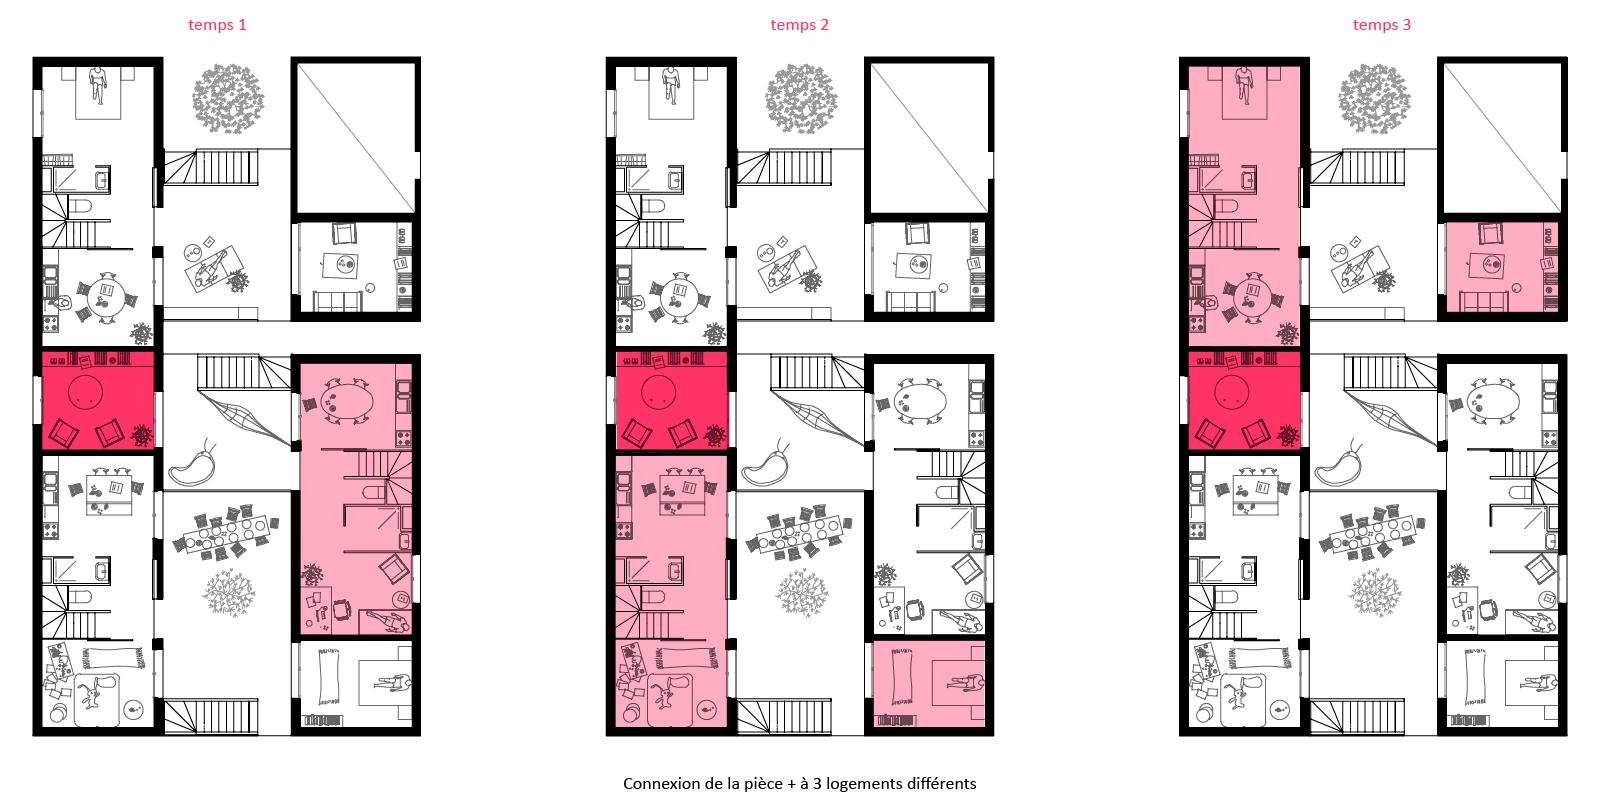 lona sophie delhay architecte. Black Bedroom Furniture Sets. Home Design Ideas